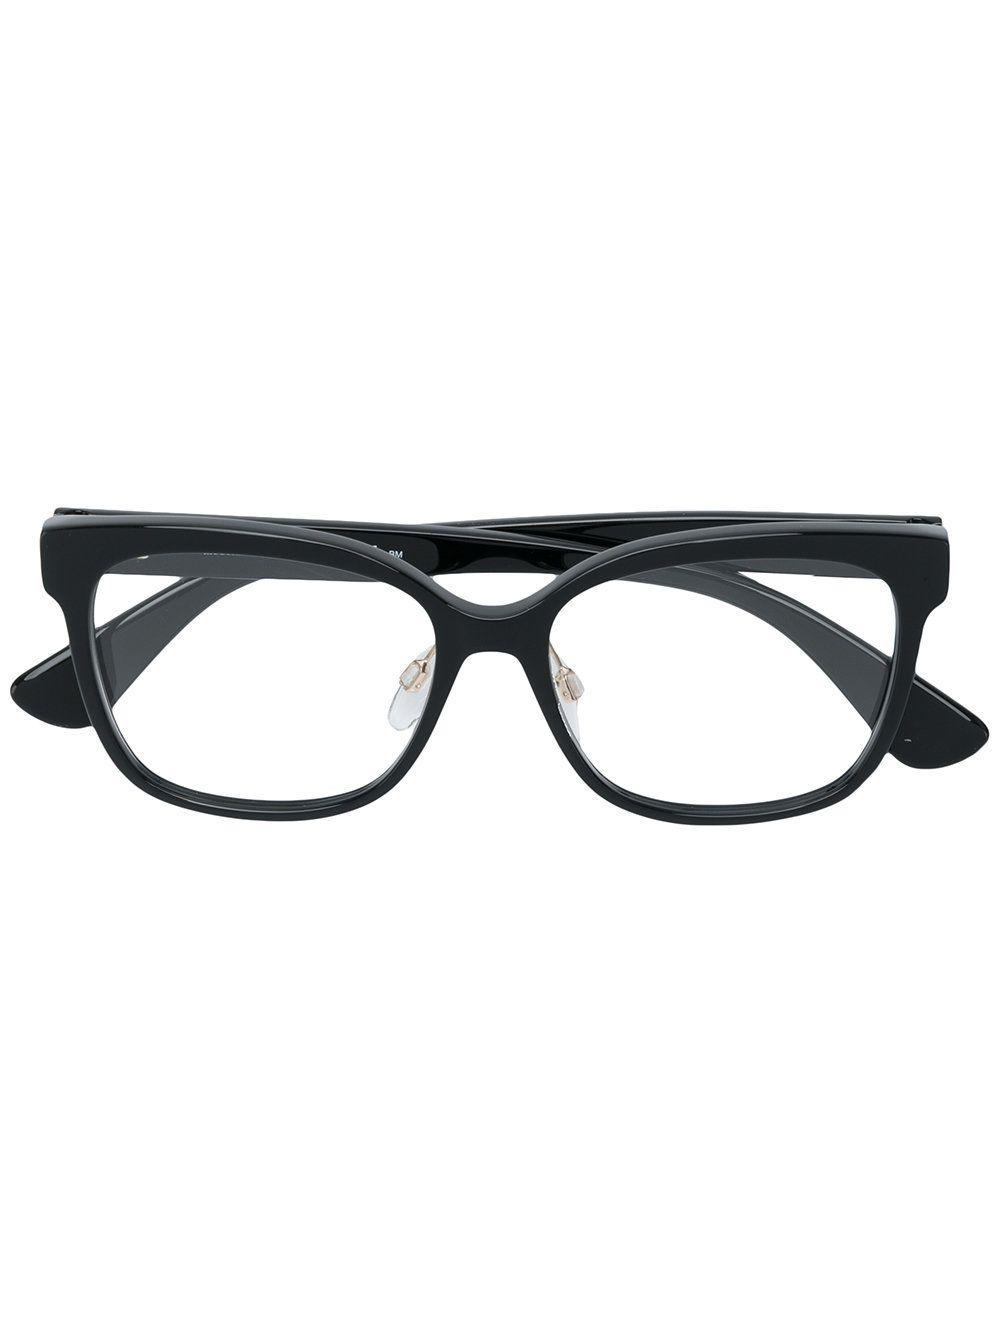 47f41dad6e68 MOSCHINO EYEWEAR . #moschinoeyewear # Cat Eye Frames, Eye Shapes,  Protective Cases,